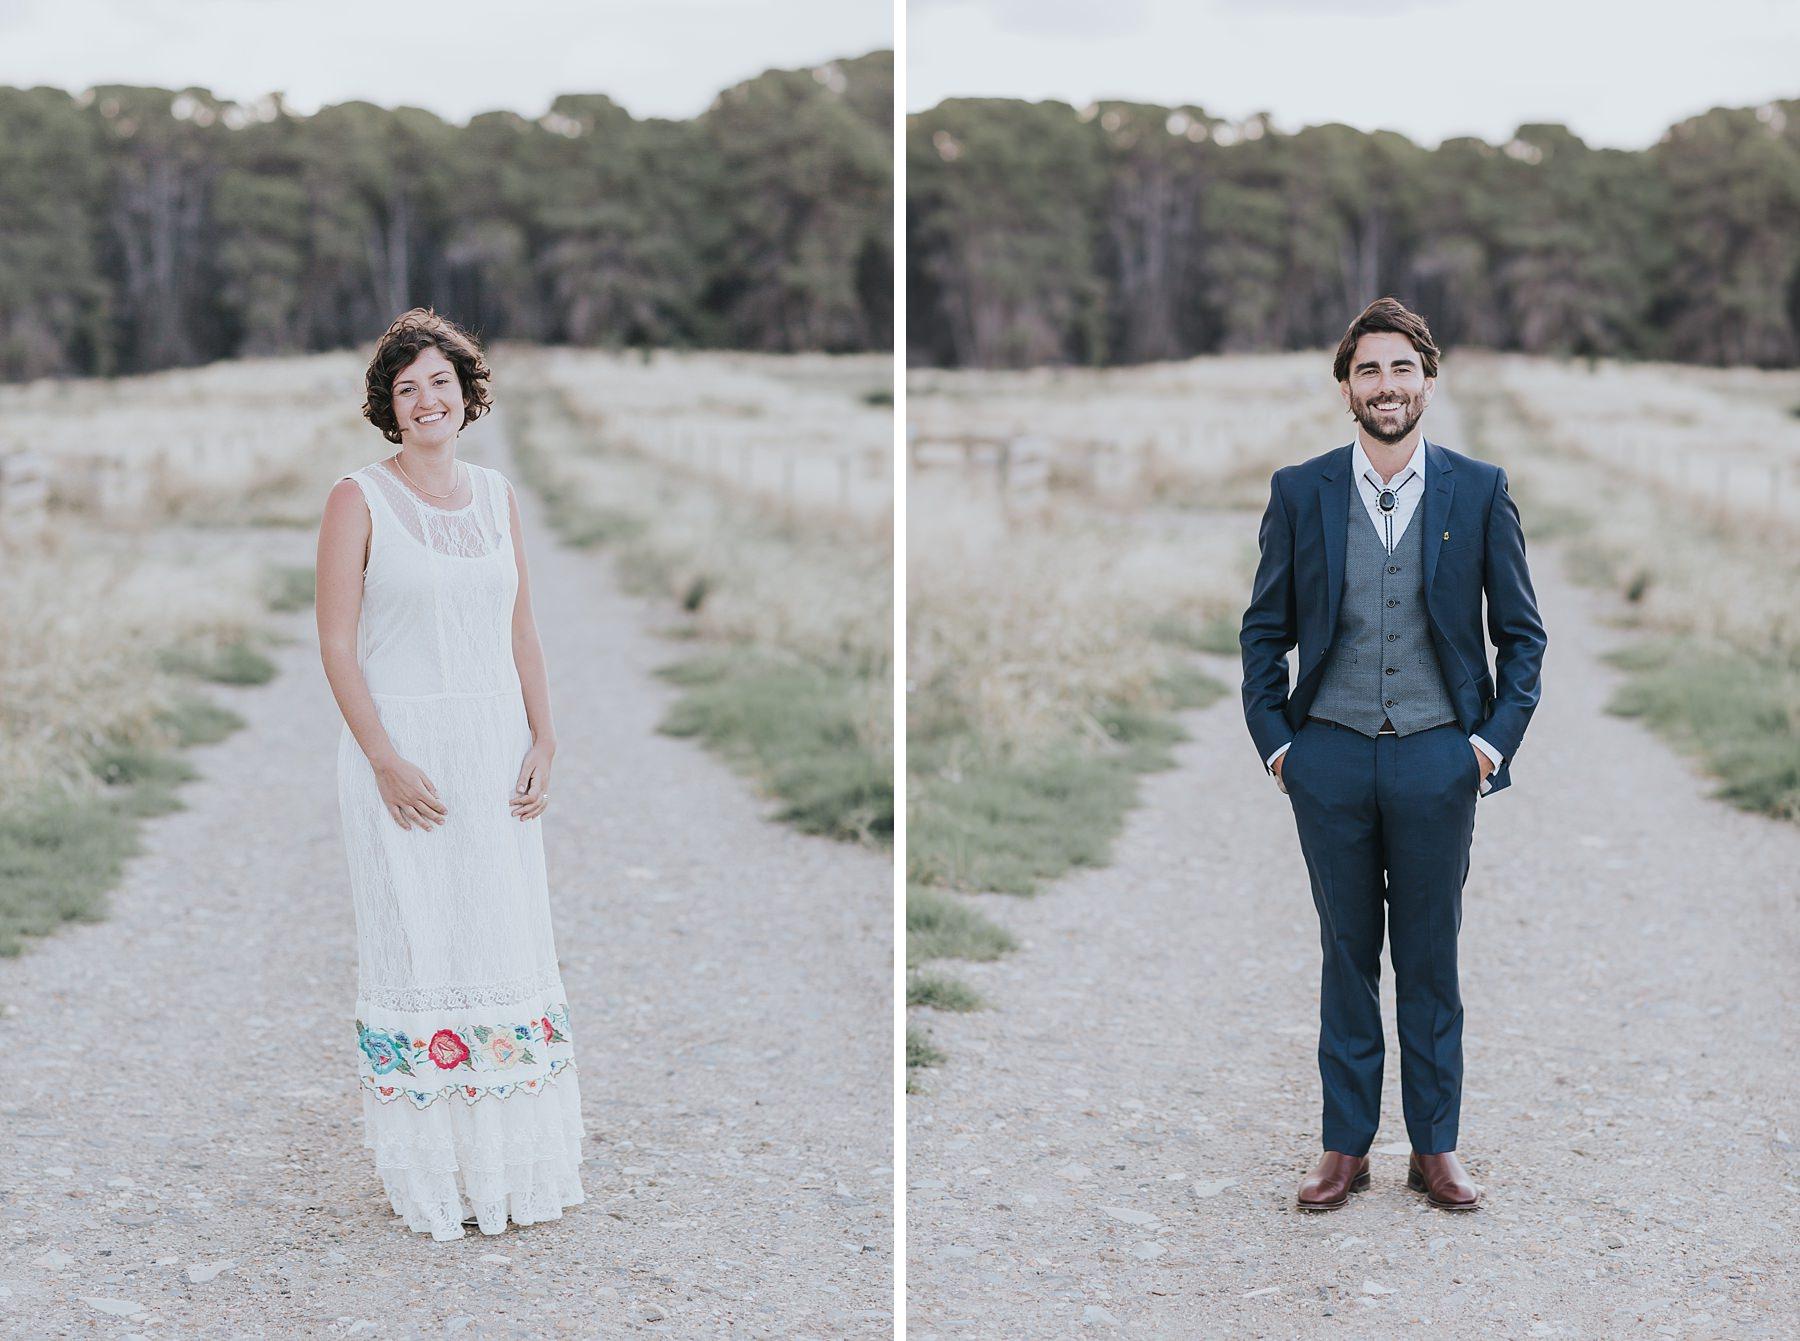 boho bride and groom styling